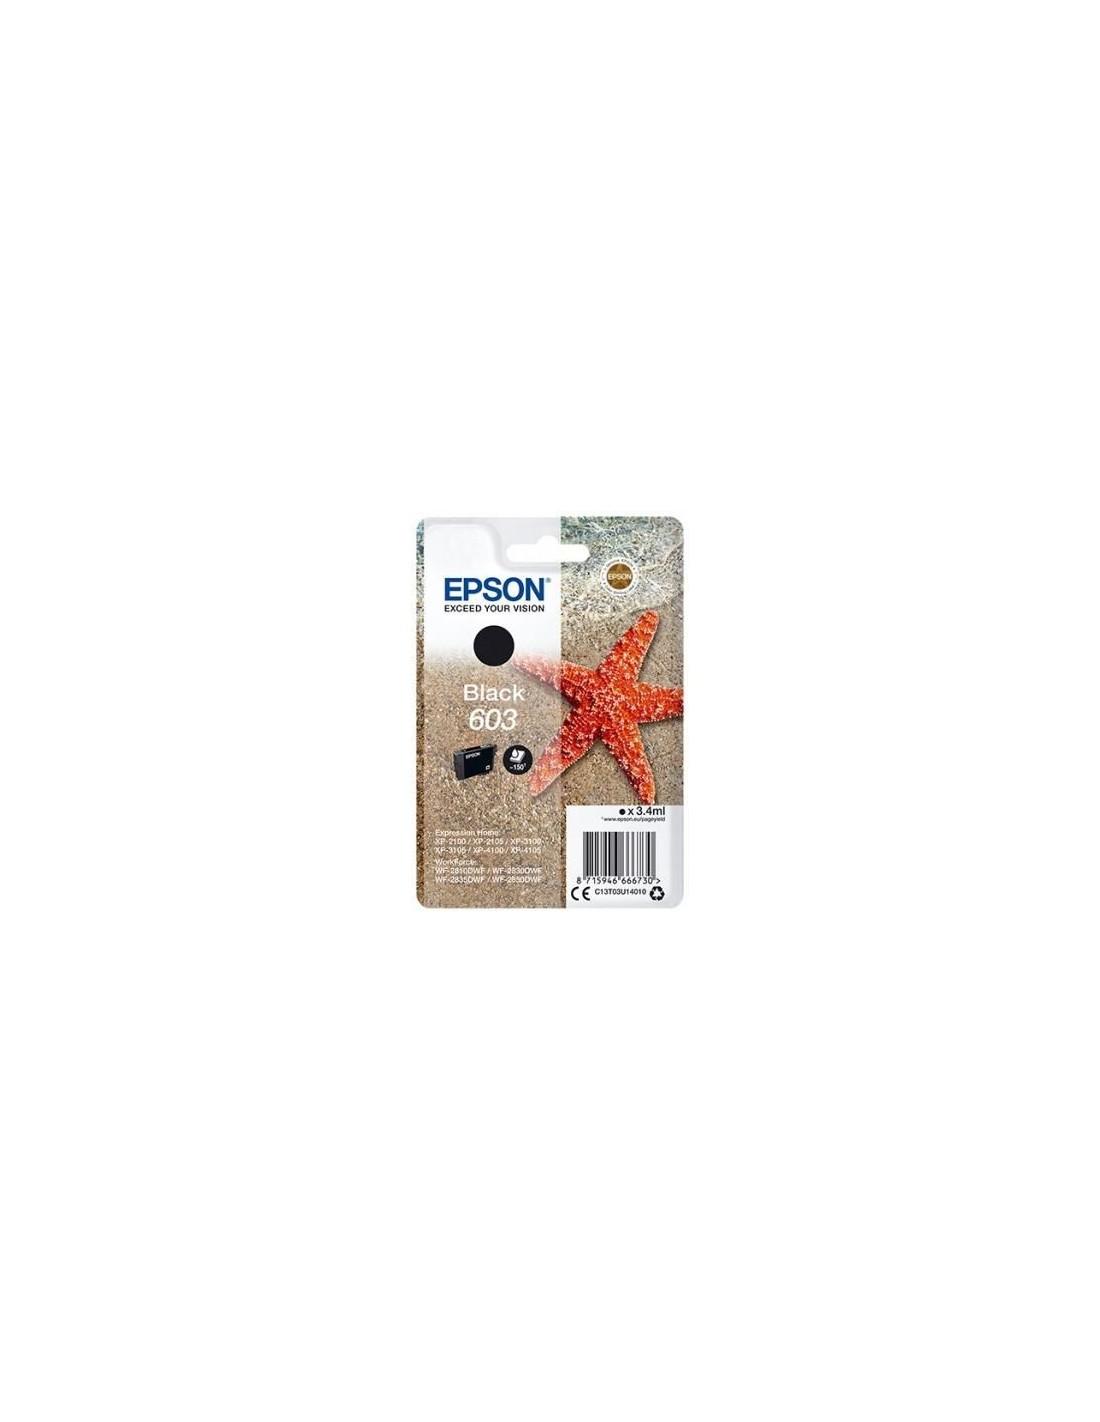 Epson tinta negra Std Estrella de mar 1 tinta 603 No Tag Single